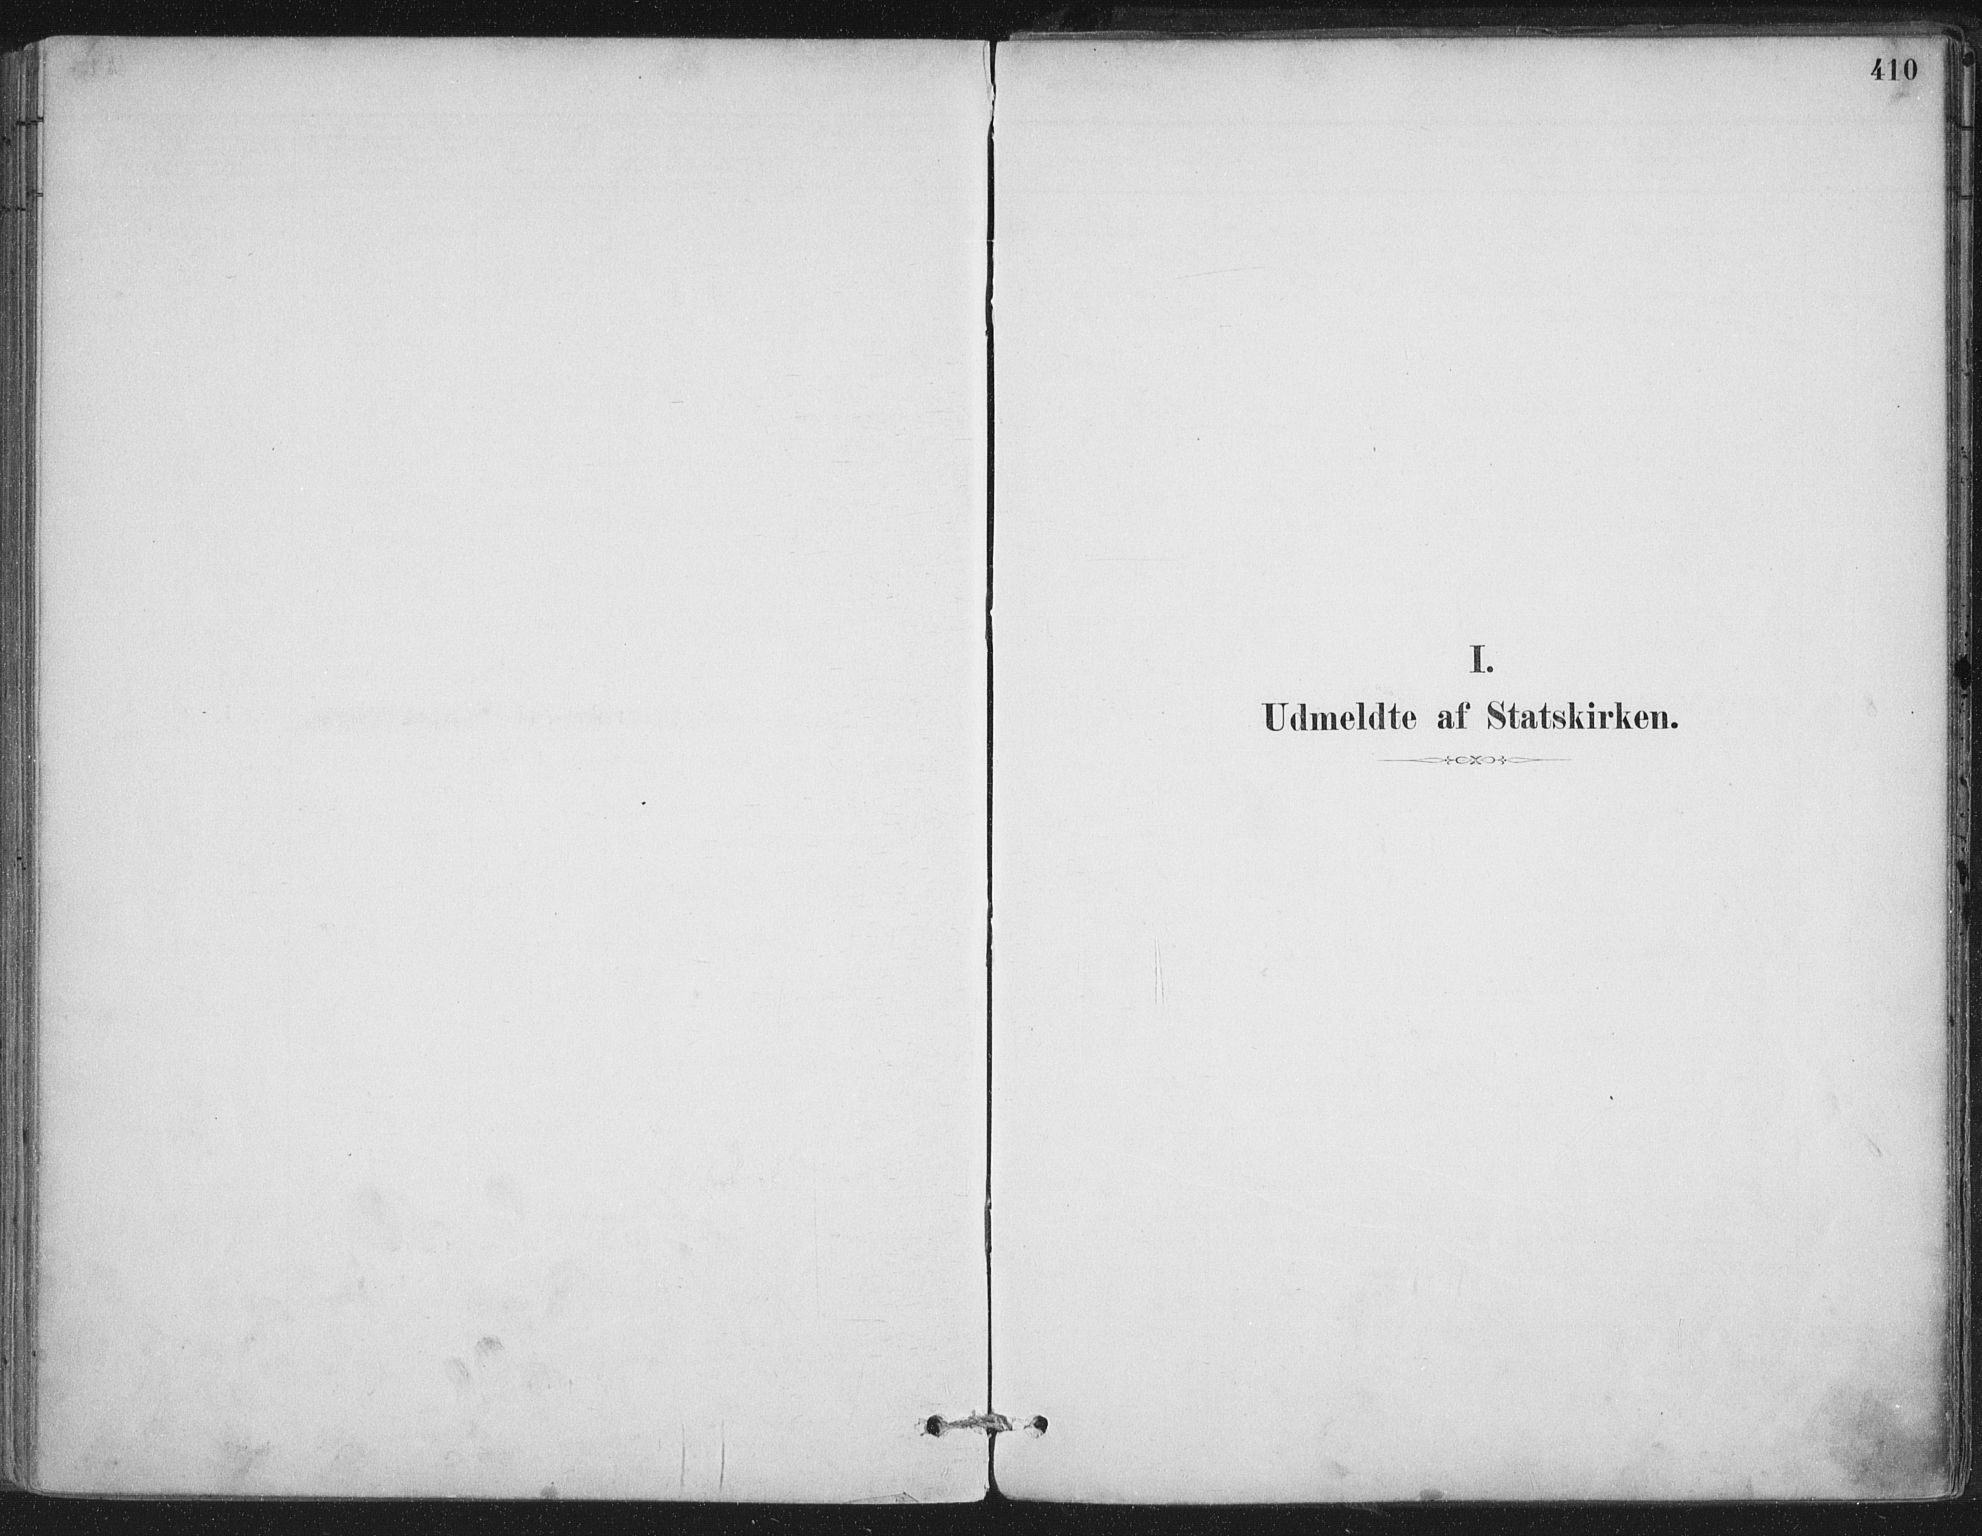 SAT, Ministerialprotokoller, klokkerbøker og fødselsregistre - Nordland, 888/L1244: Ministerialbok nr. 888A10, 1880-1890, s. 410